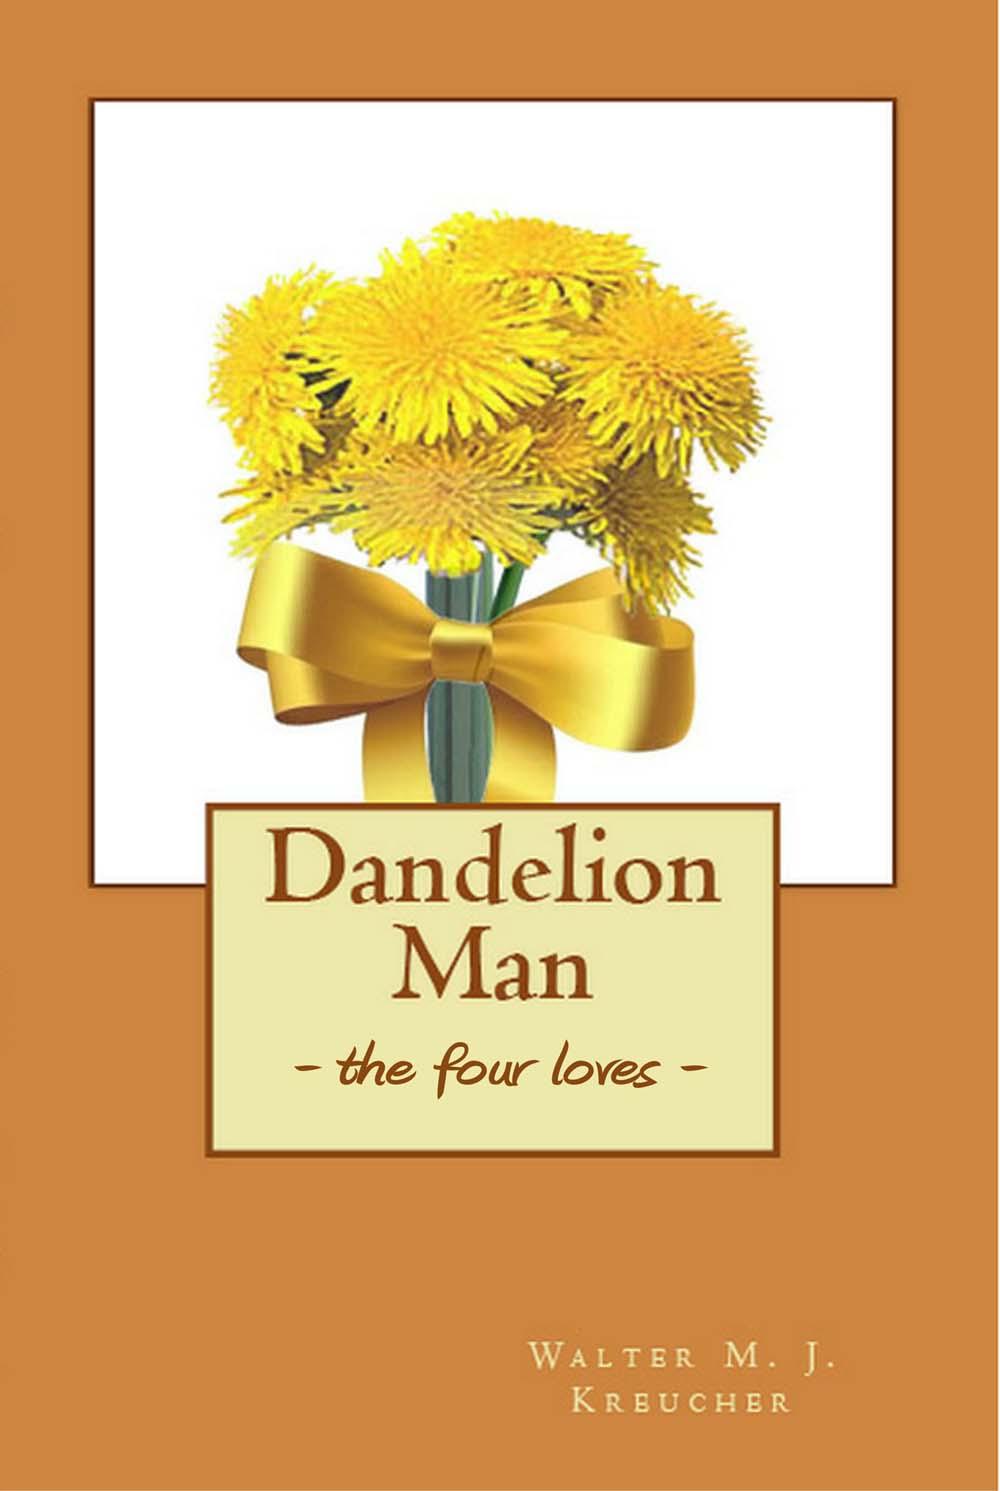 Dandelion Man - the four lovew